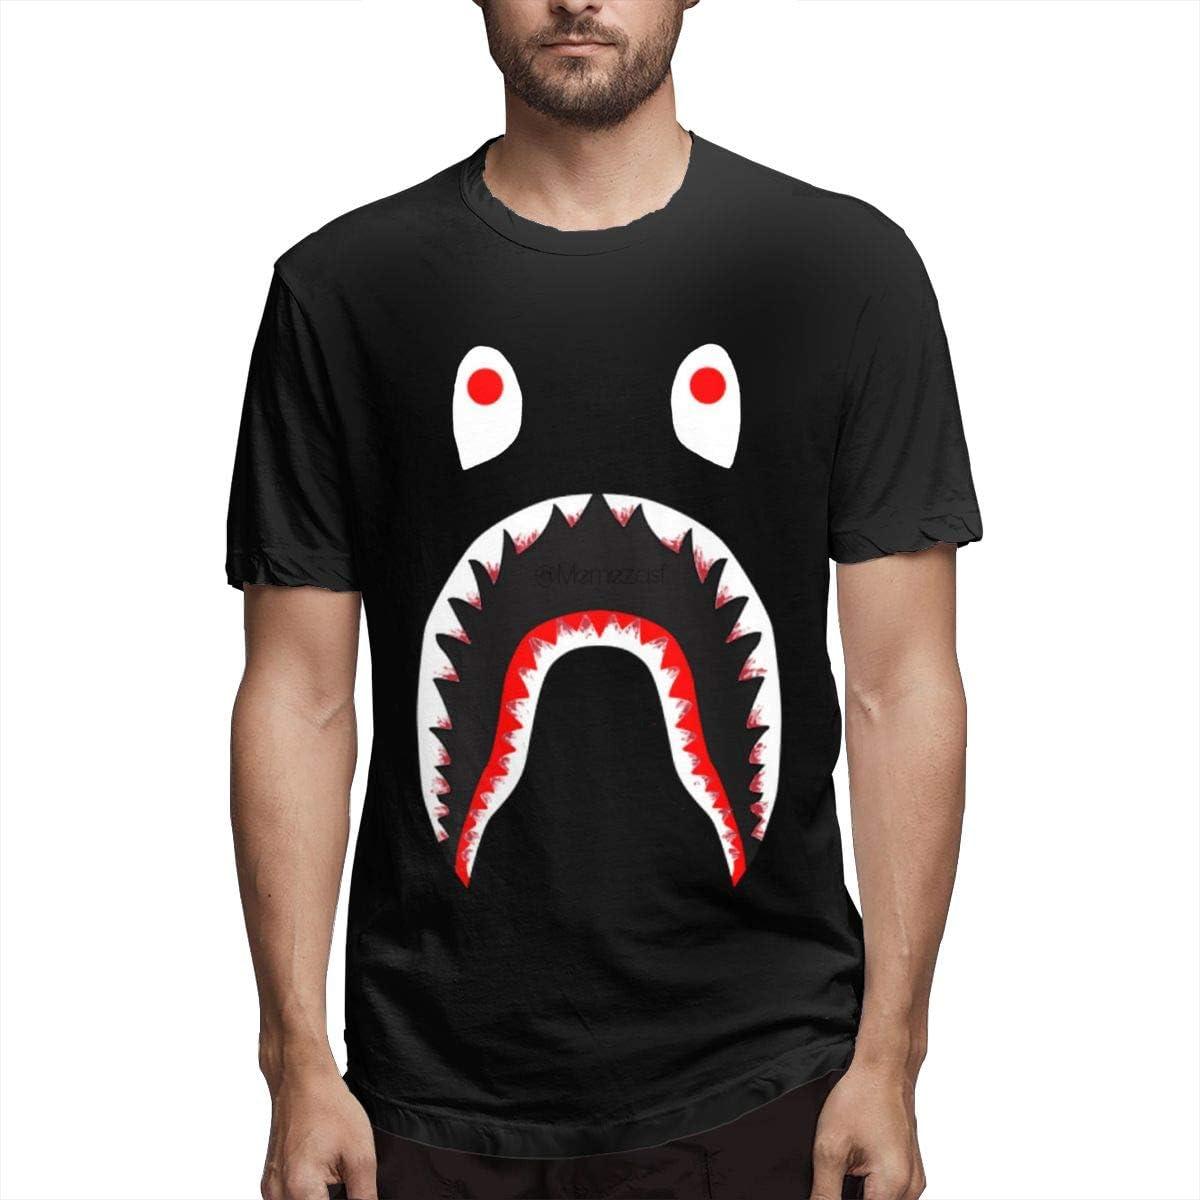 Bape Blood Shark T Shirts Men Tops Round Neck Cotton Short Sleeves Tees